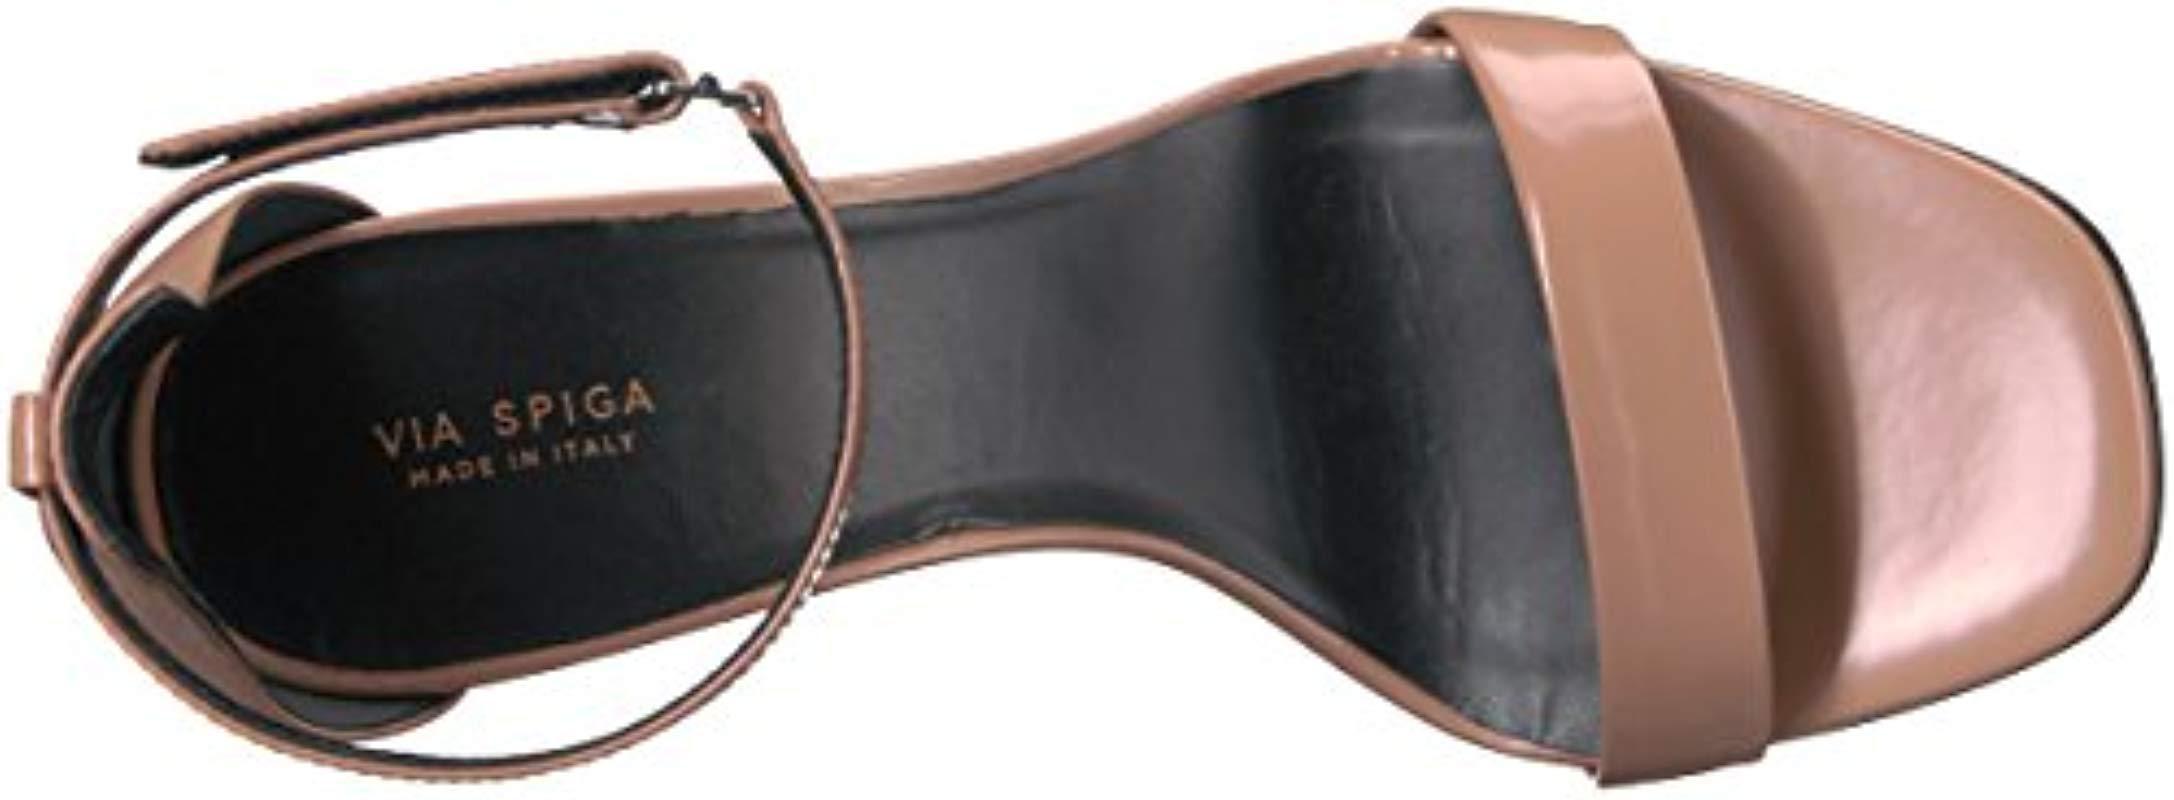 8270a32457c Women's Faxon Angular Heel Sandal Heeled